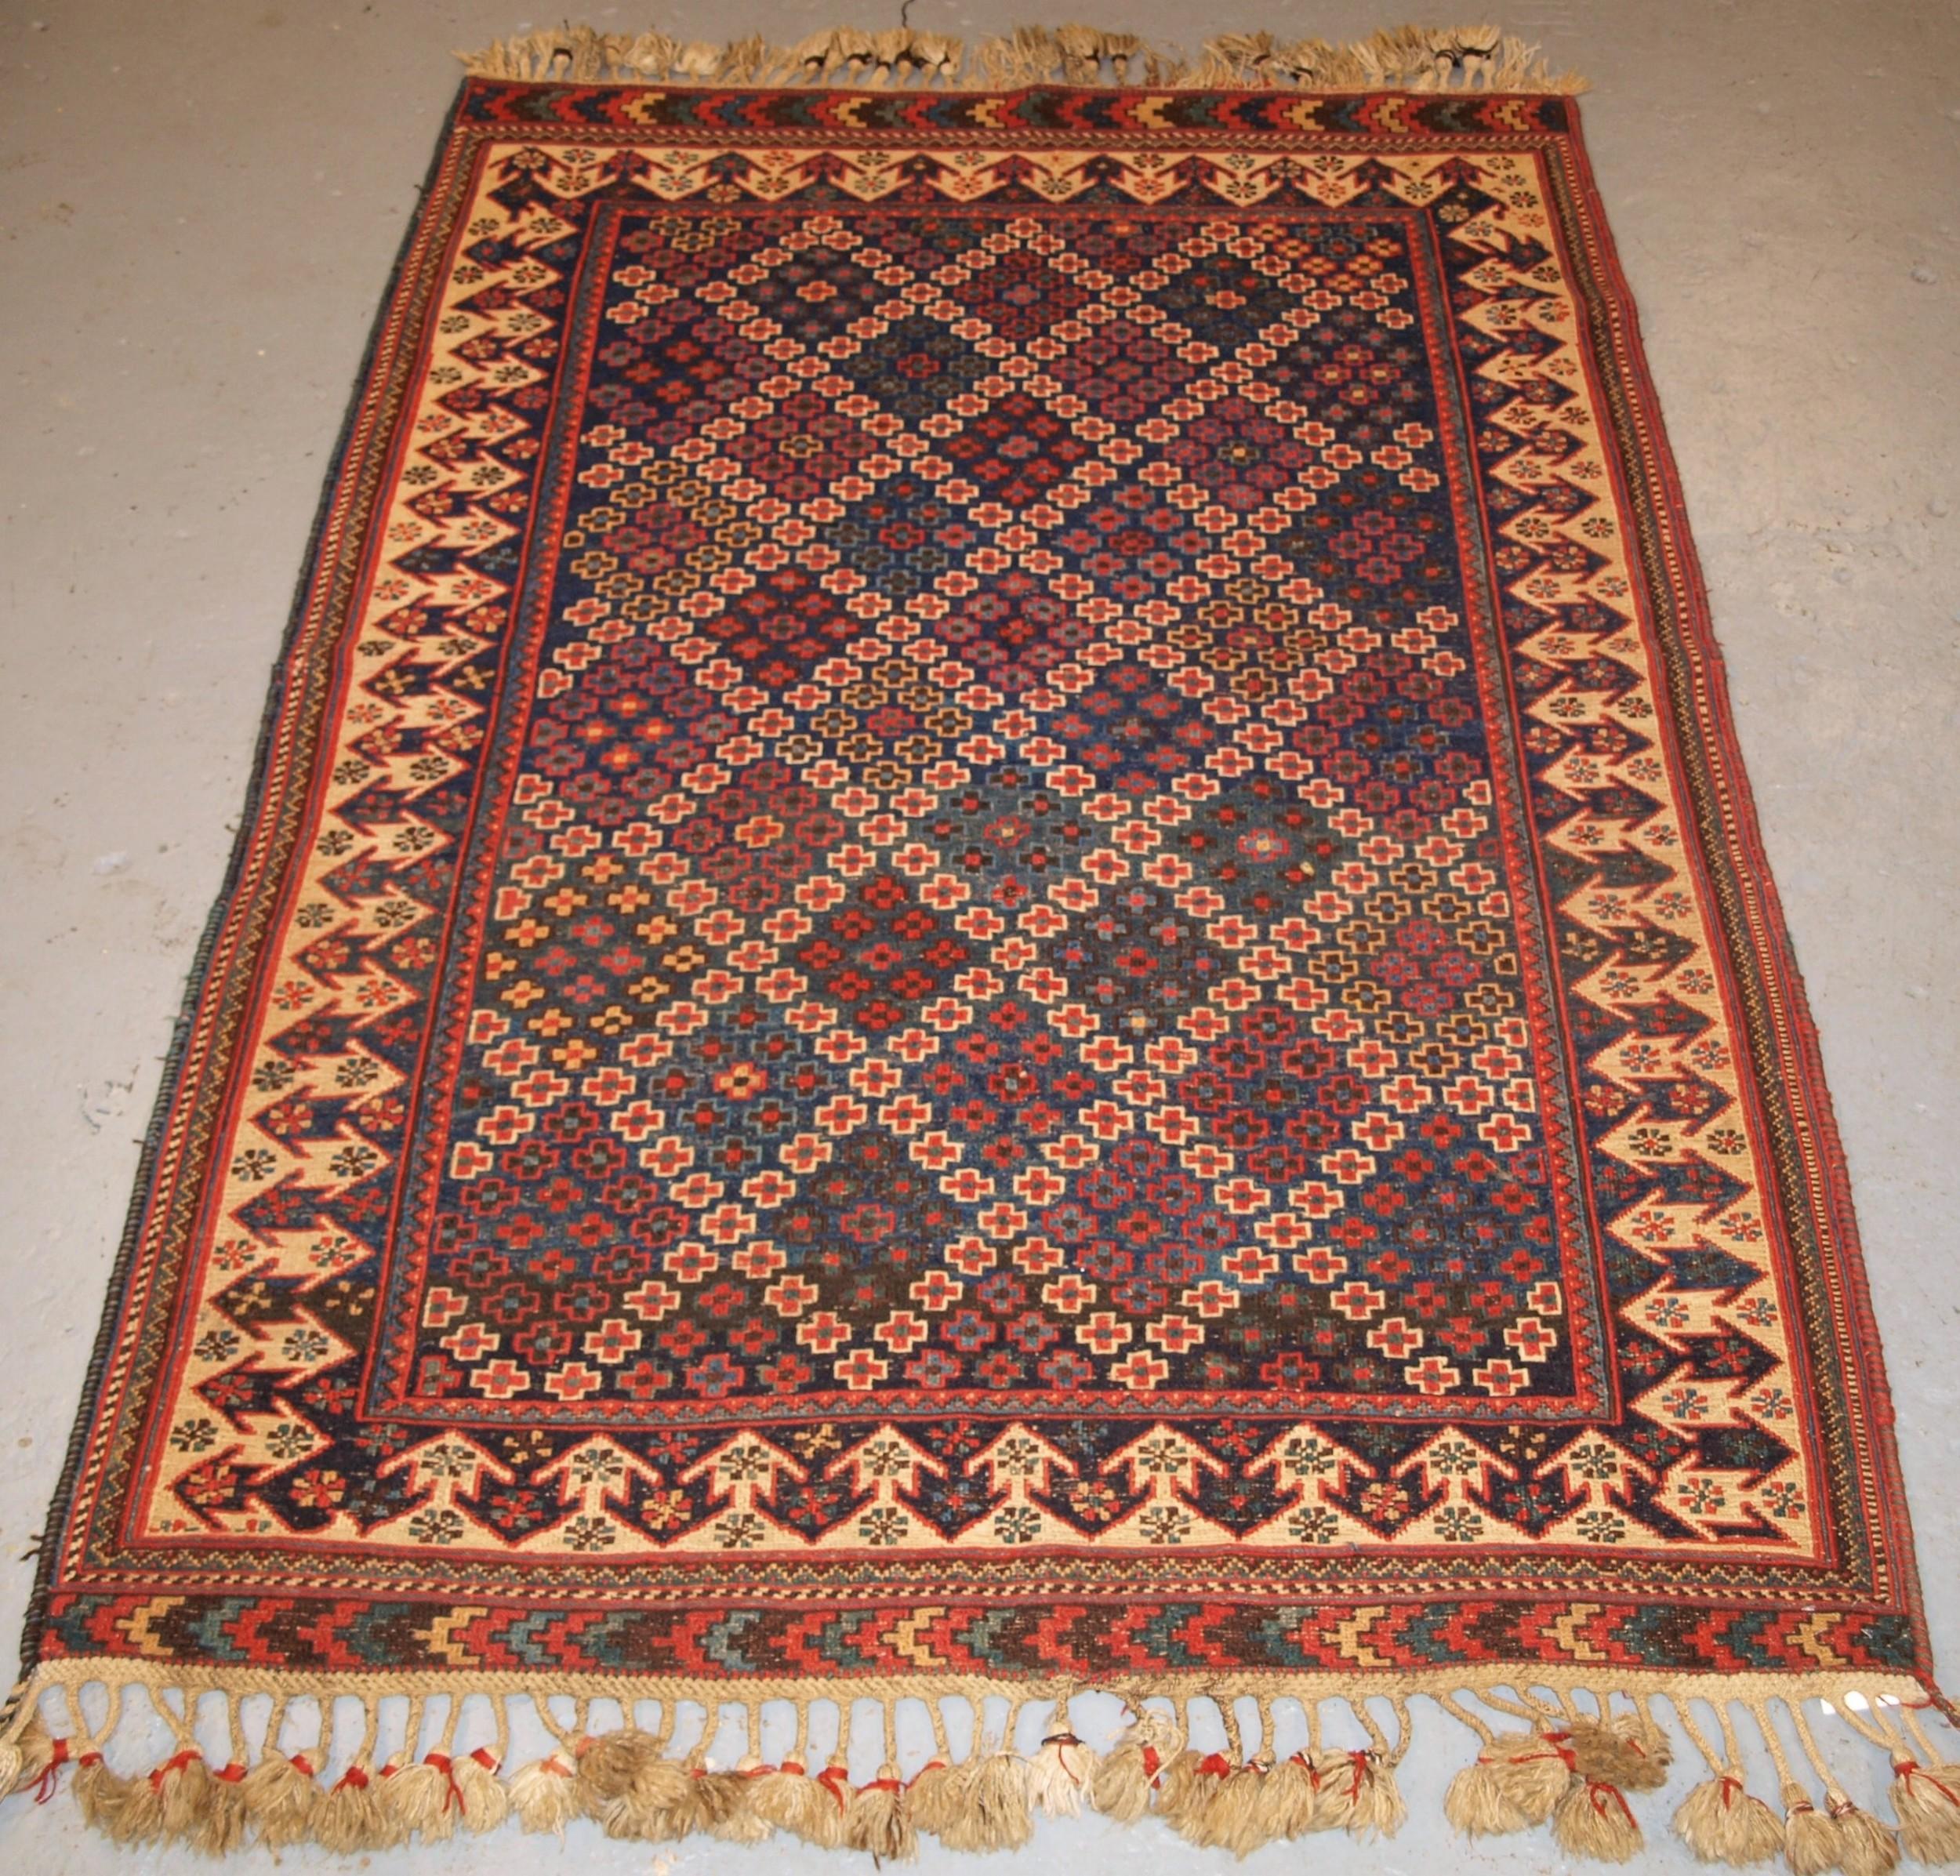 old afshar soumak rug superb original condition circa 1920